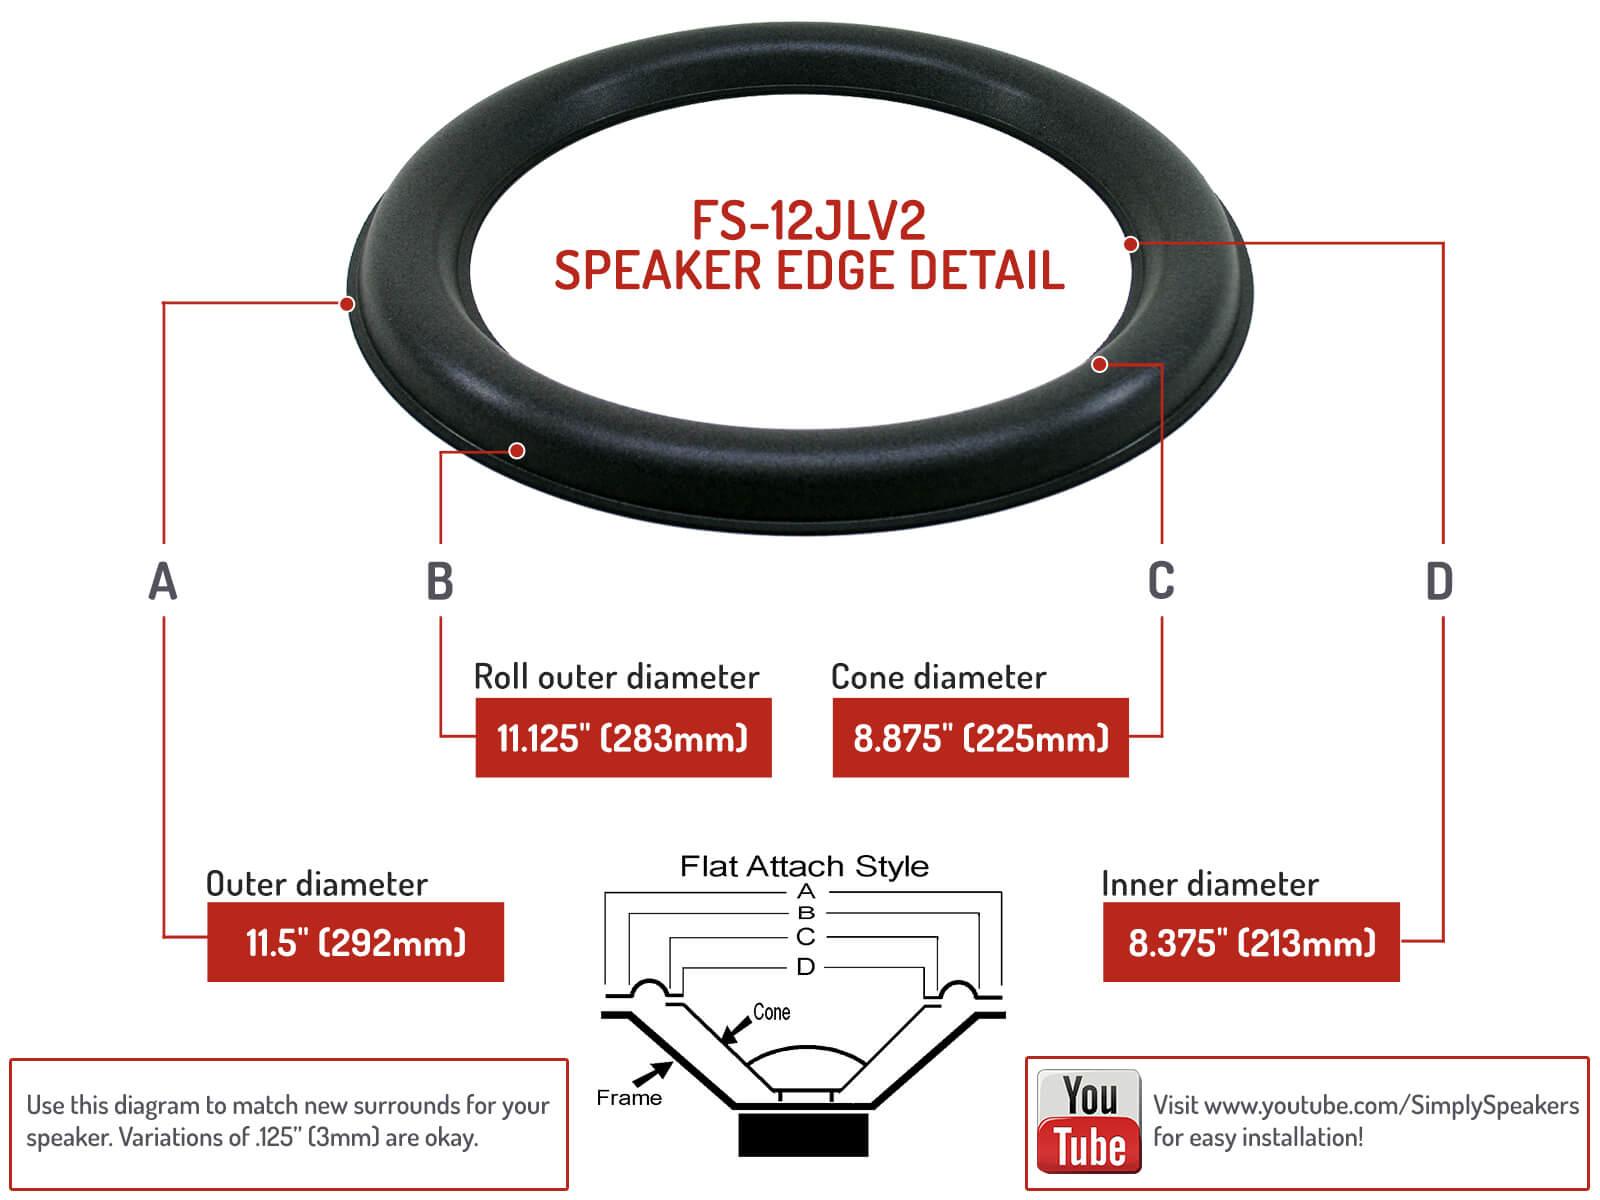 Jl audio speaker foam edge repair kit 12 12w6 version 2 12w6 v video sciox Gallery